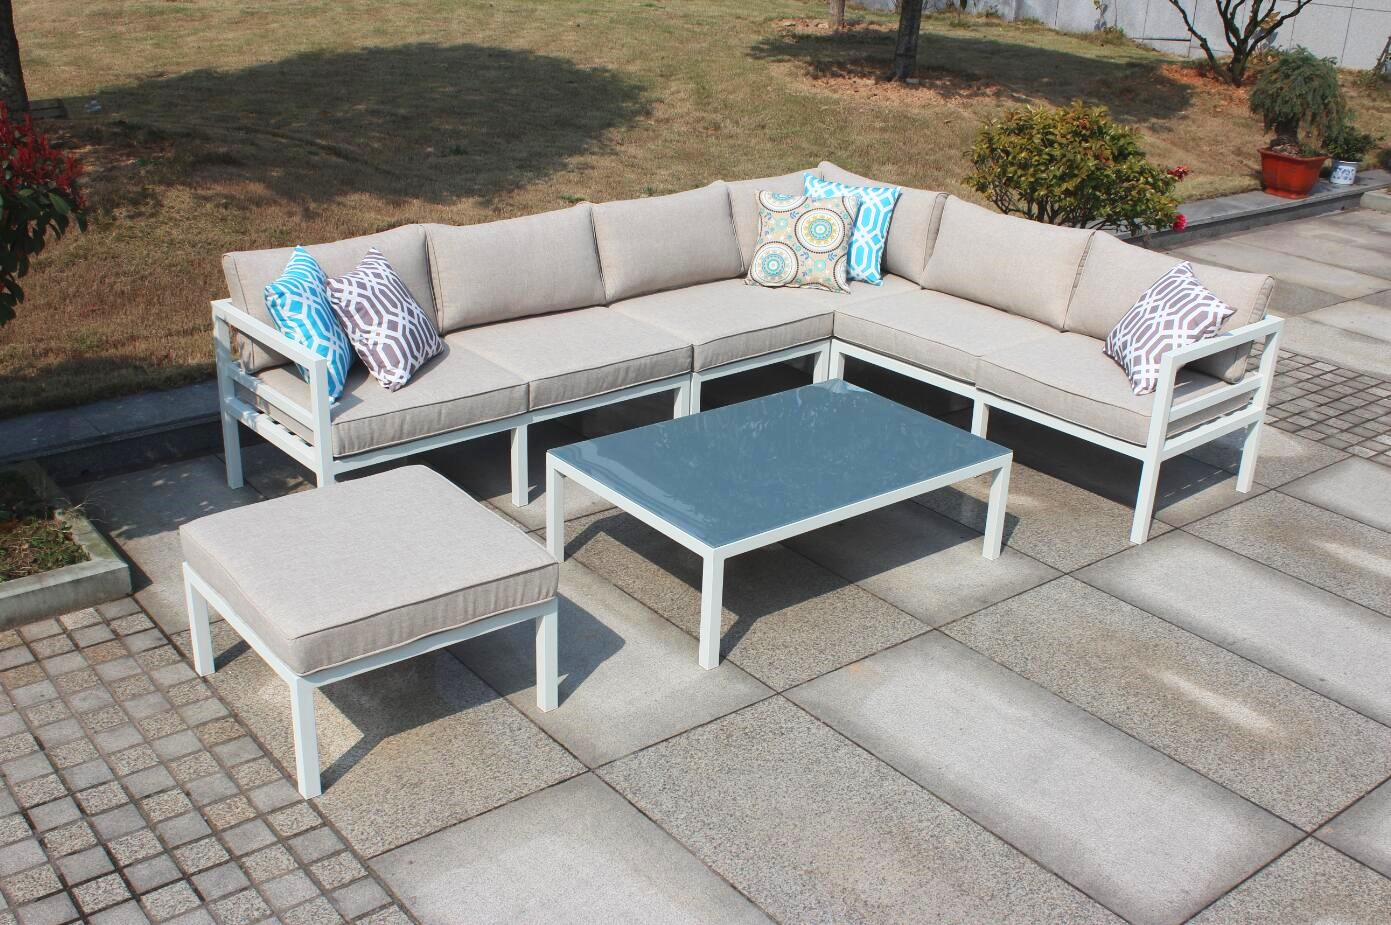 sofas valencia espana 6 piece sectional sofa covers corner set with stool firmans direct